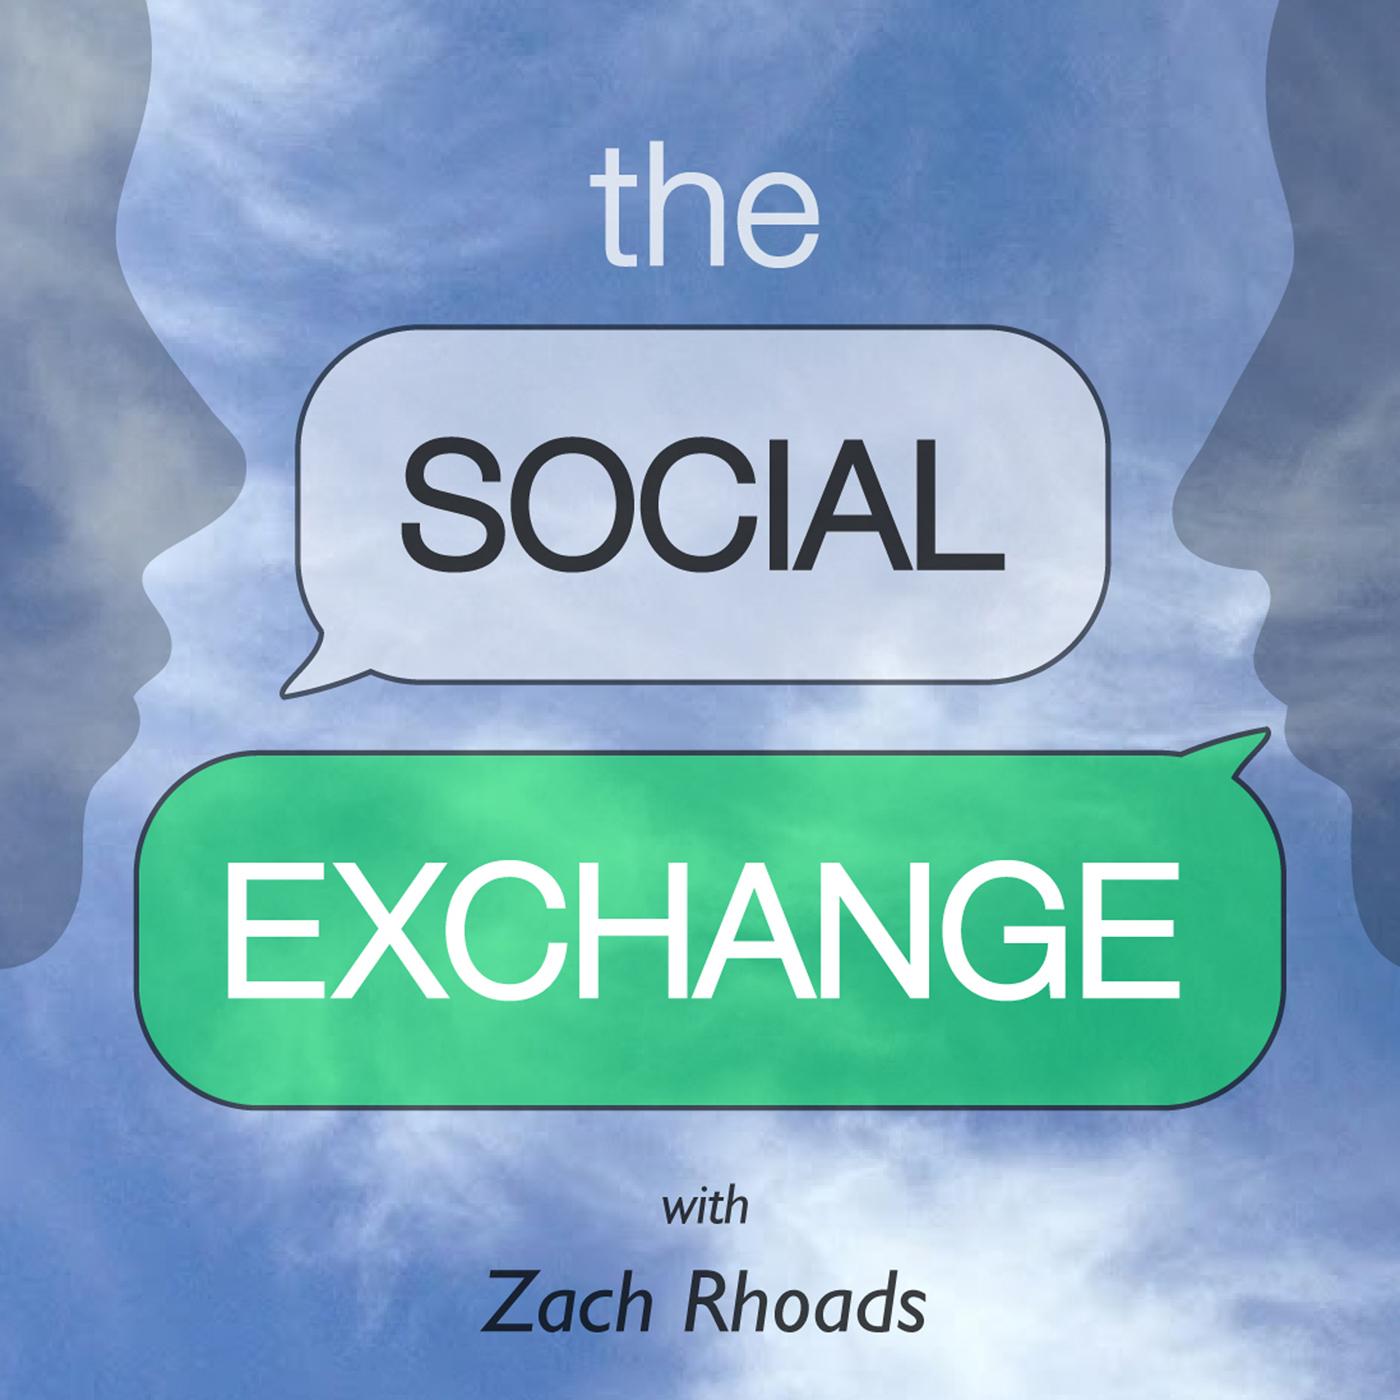 The Social Exchange show art